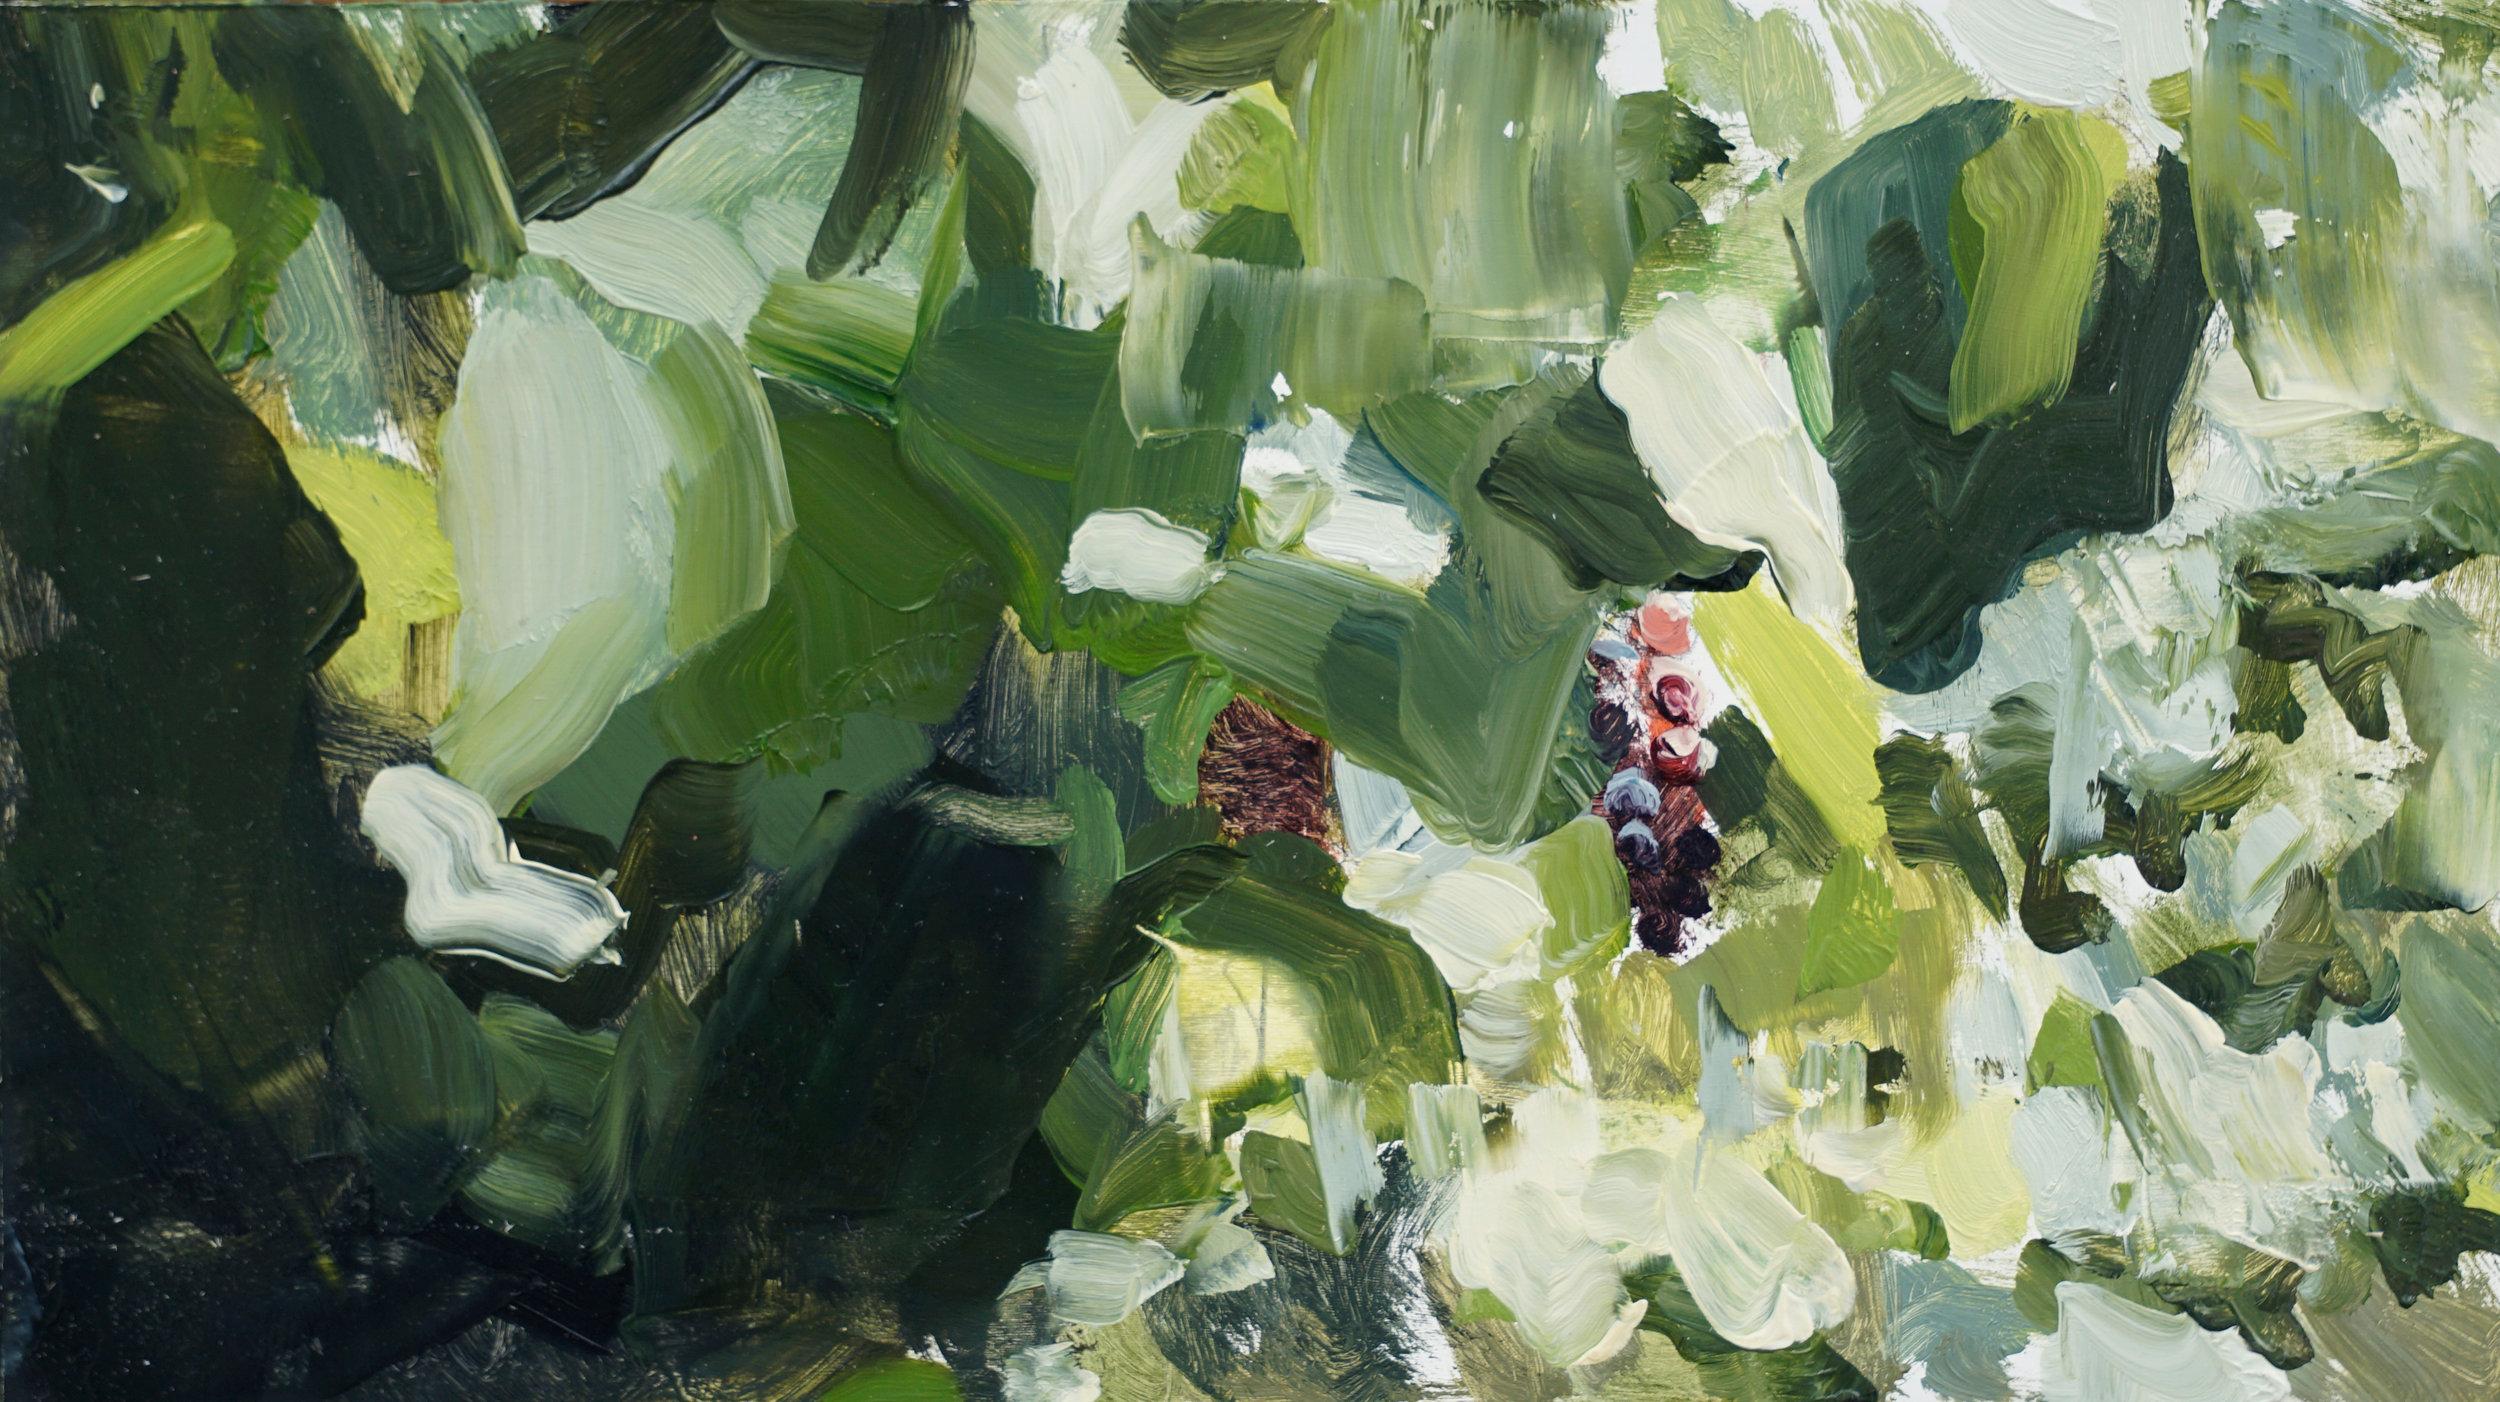 mark-crenshaw-1737-grapevine-split.jpg